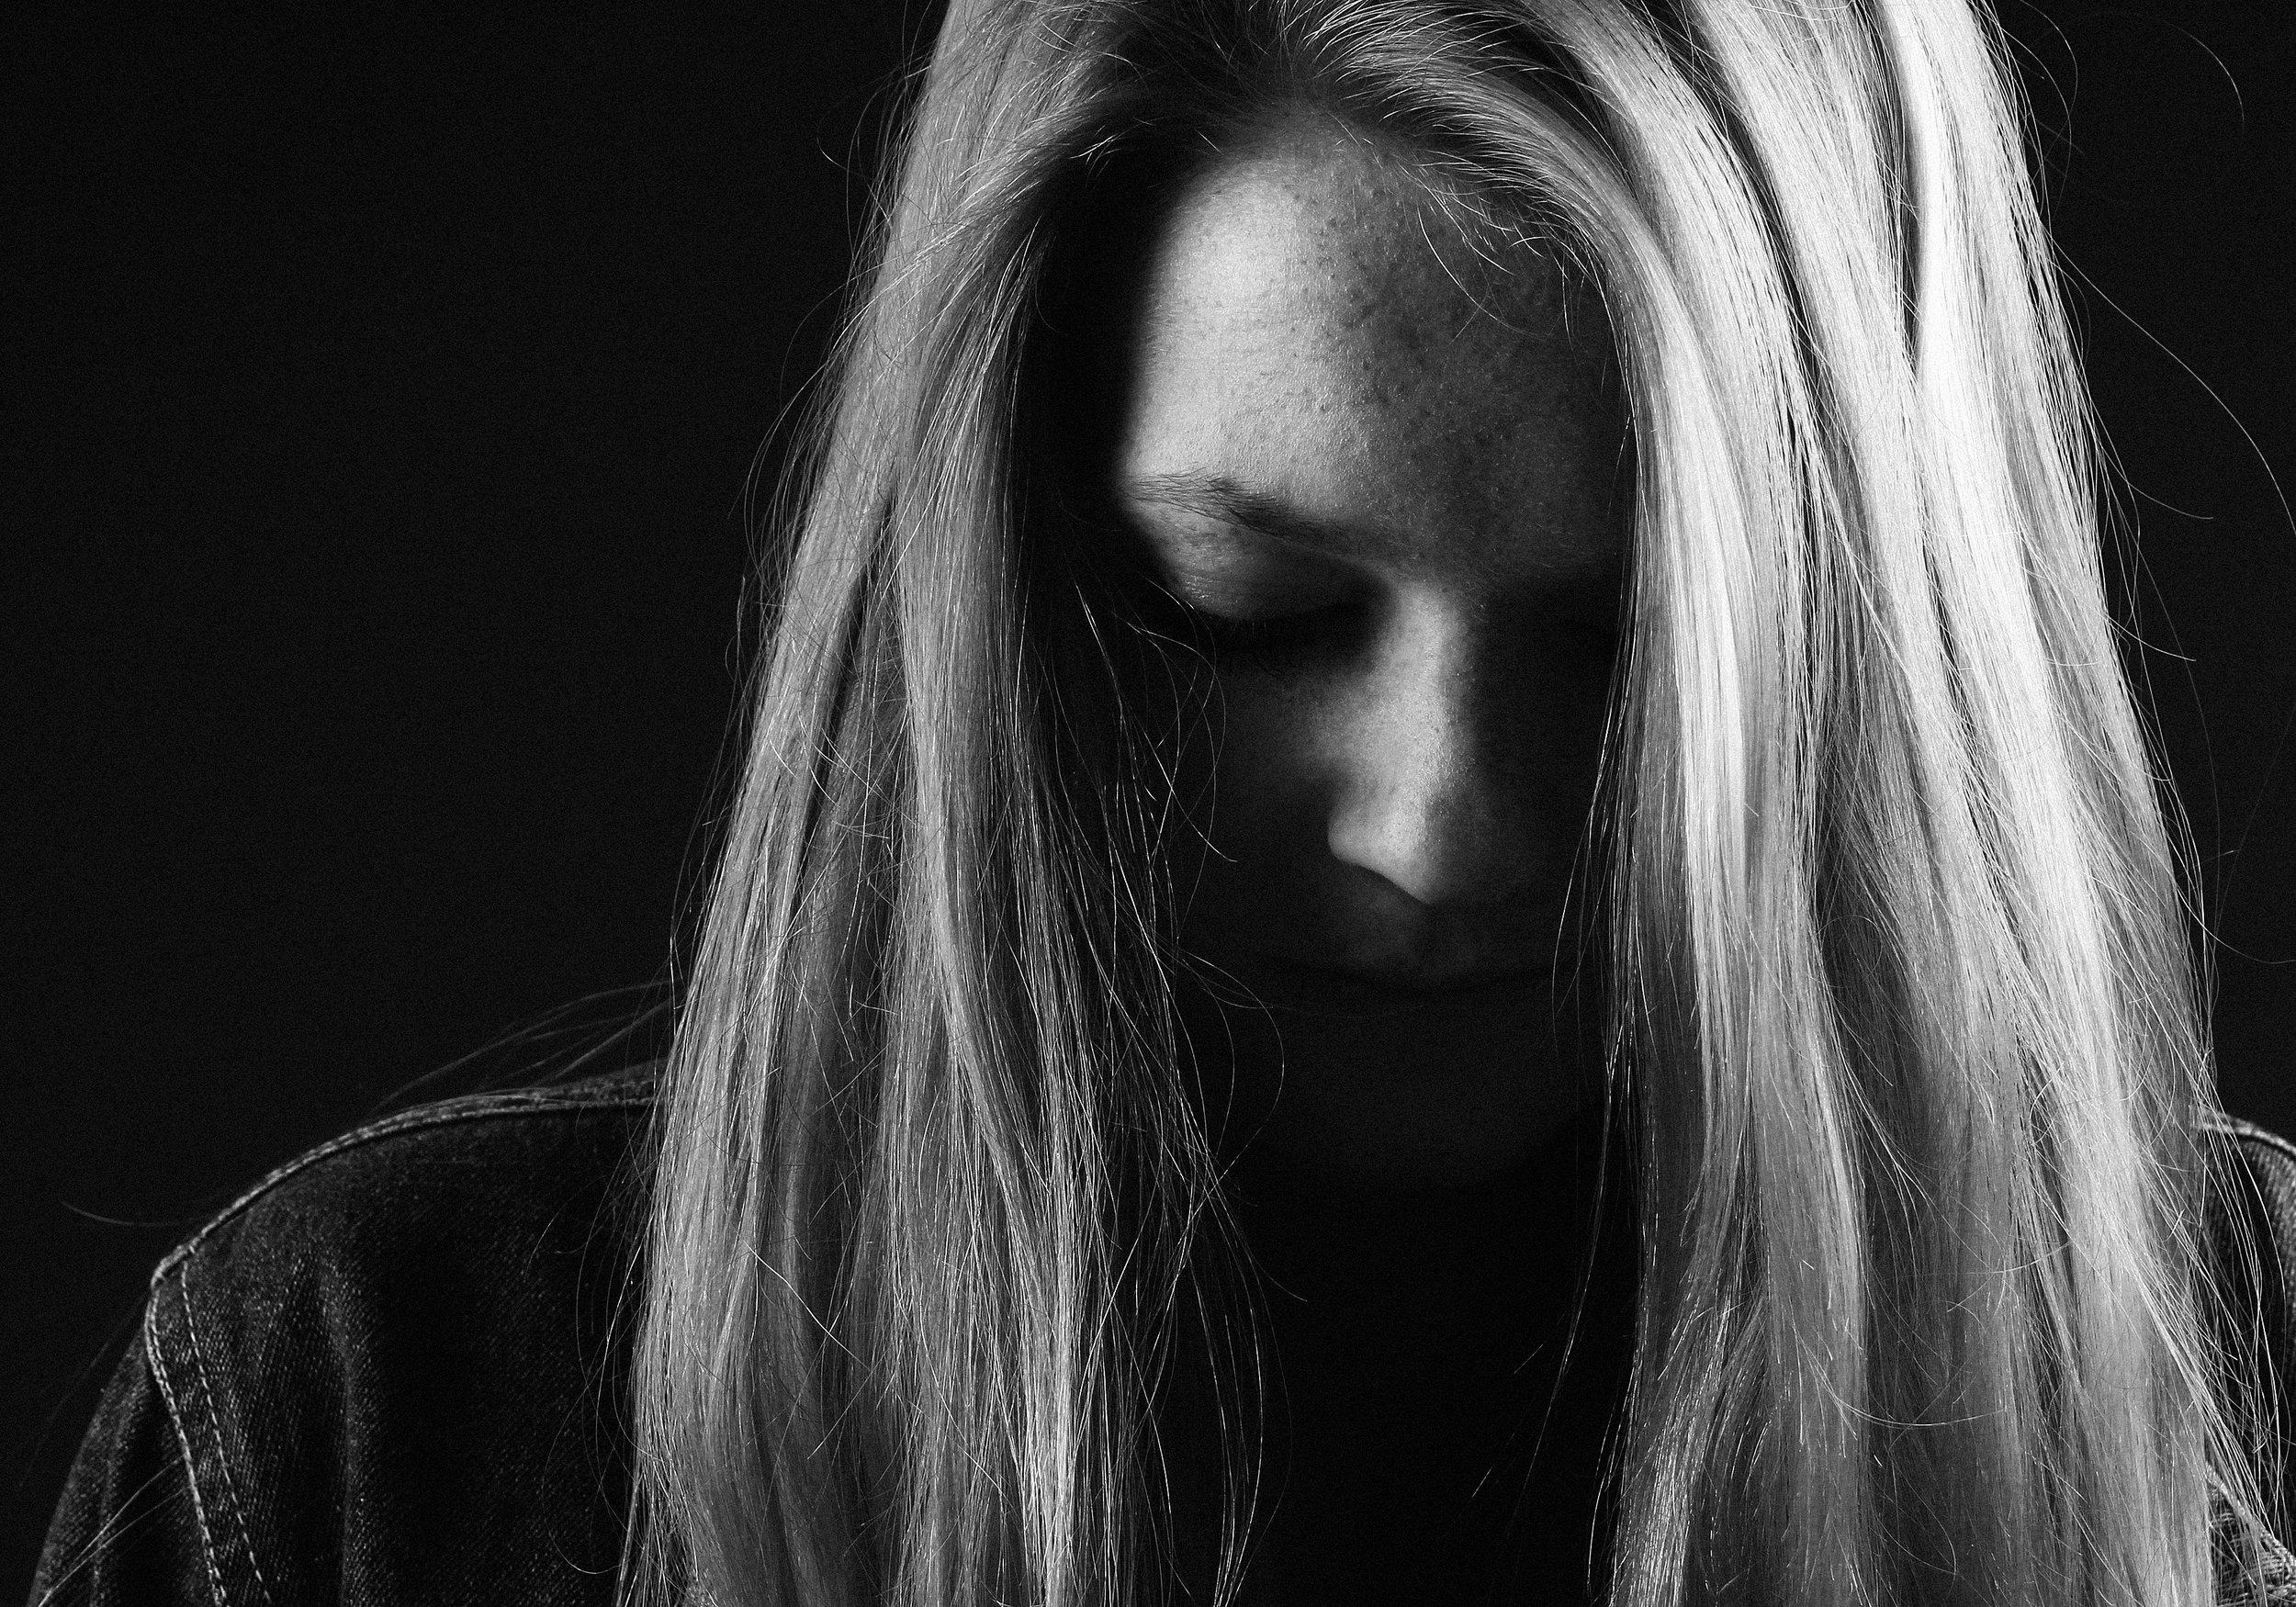 girl-sadness-dark-46508.jpeg